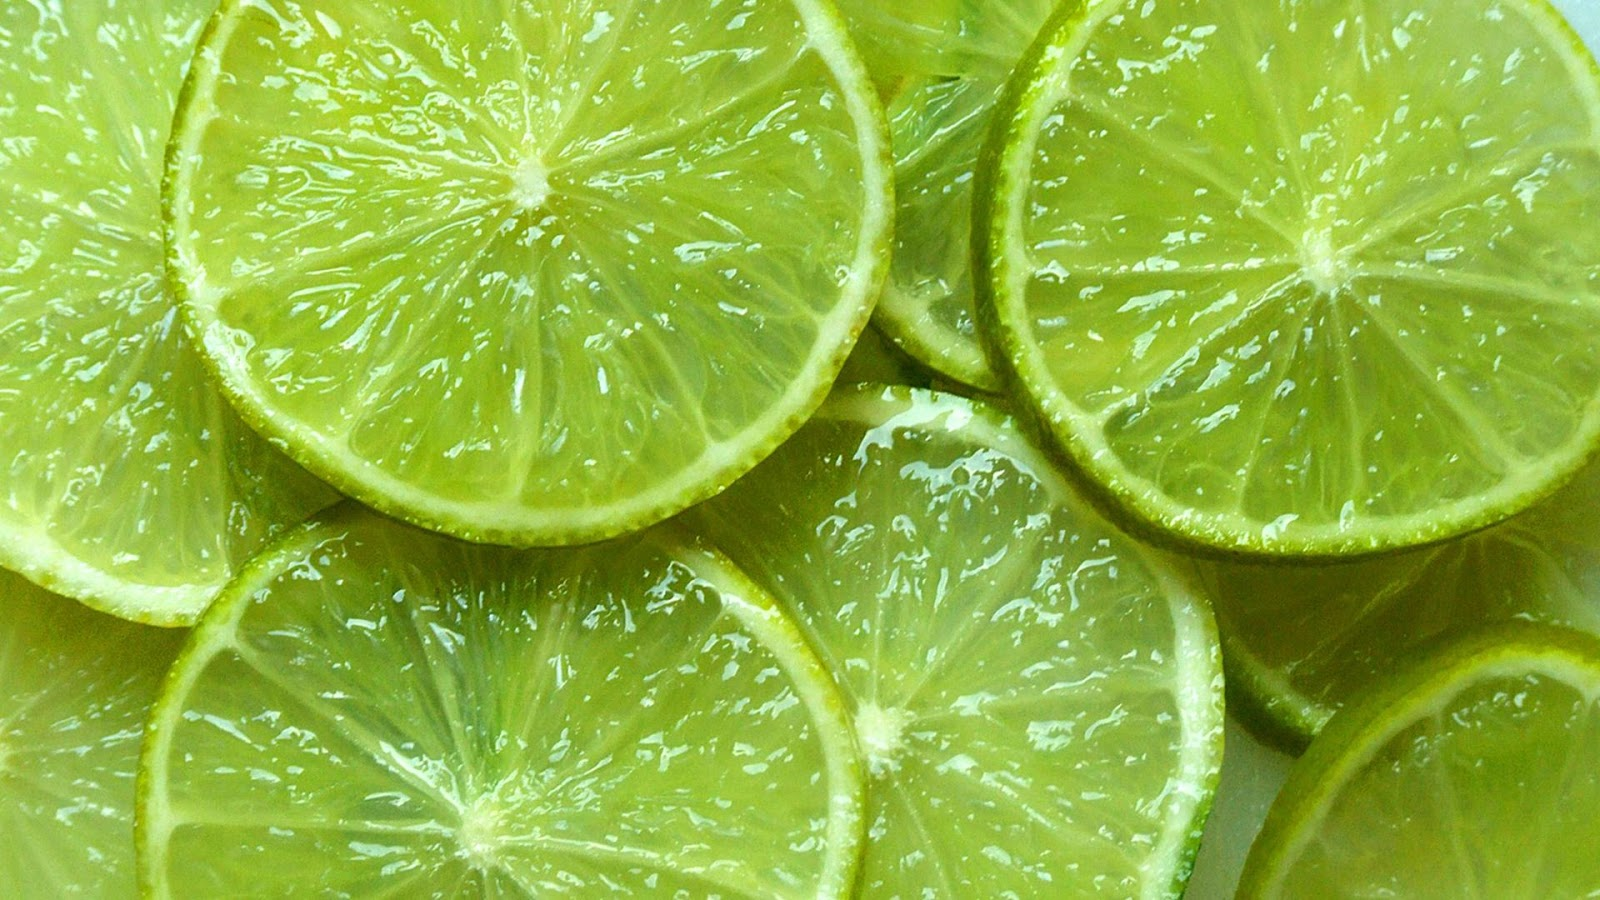 Fresh fruit wallpaper - Fresh Fruit Wallpaper Hd Screenshot